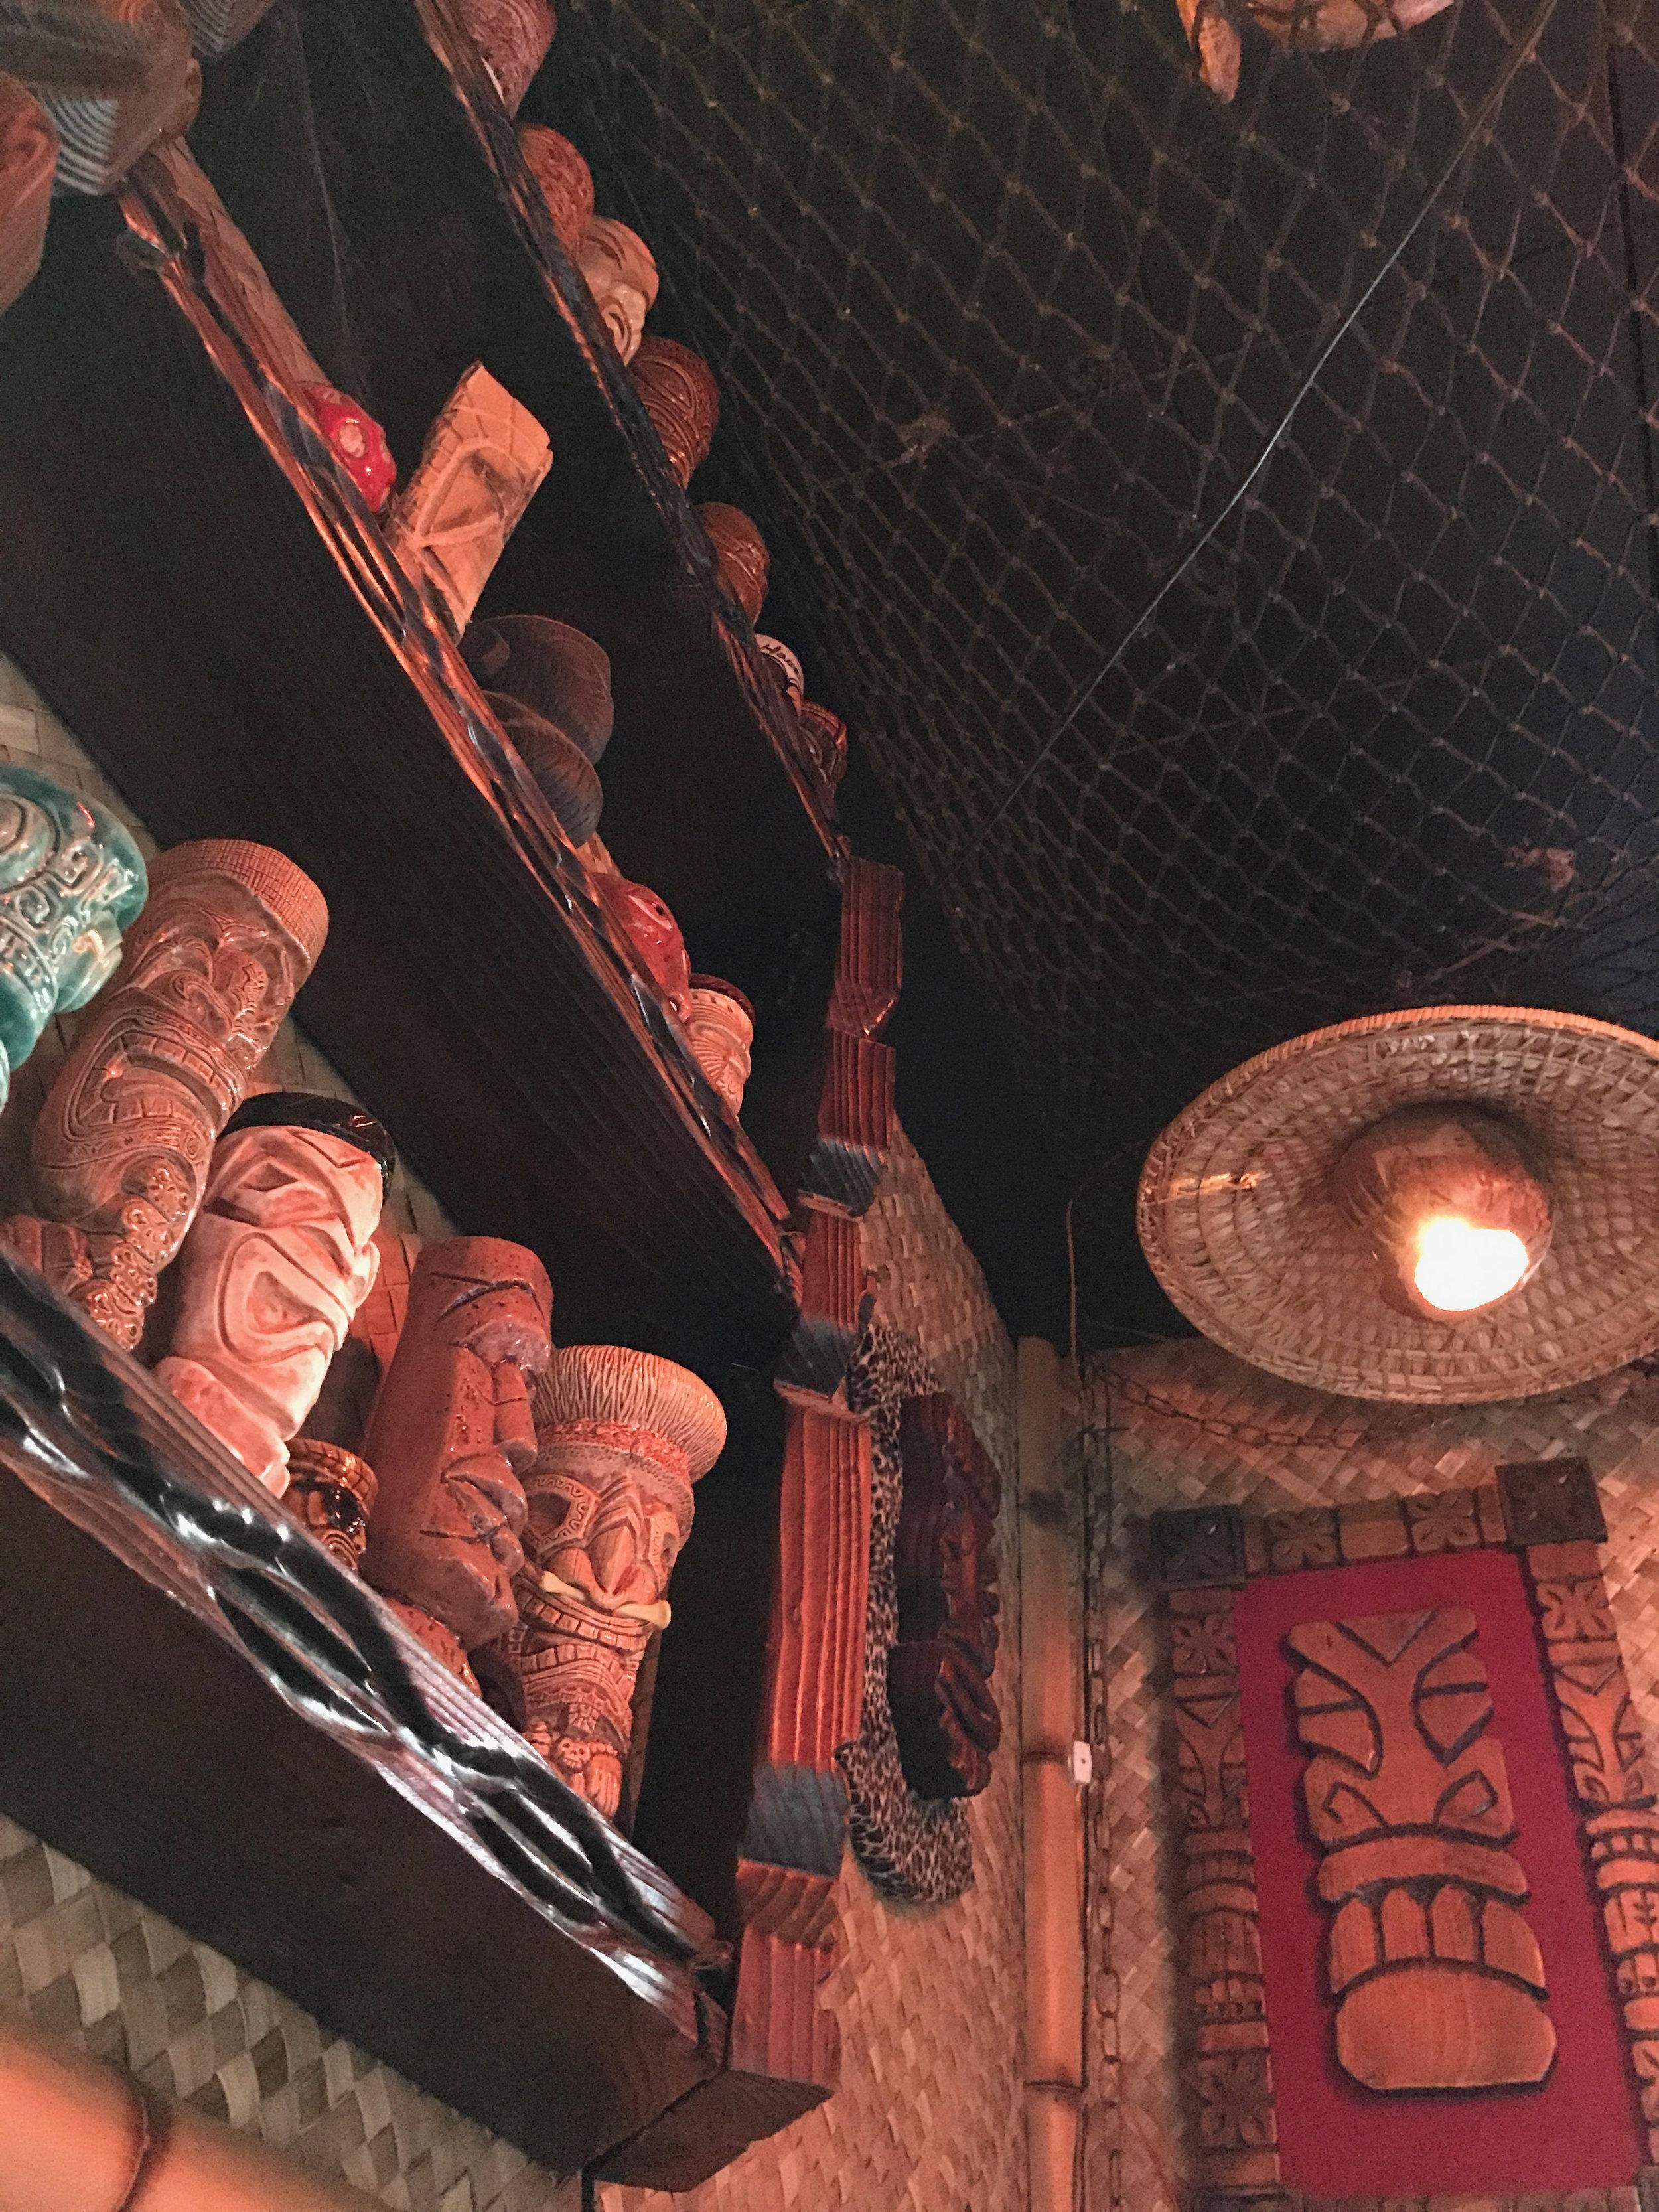 Inside the Rumpus Room